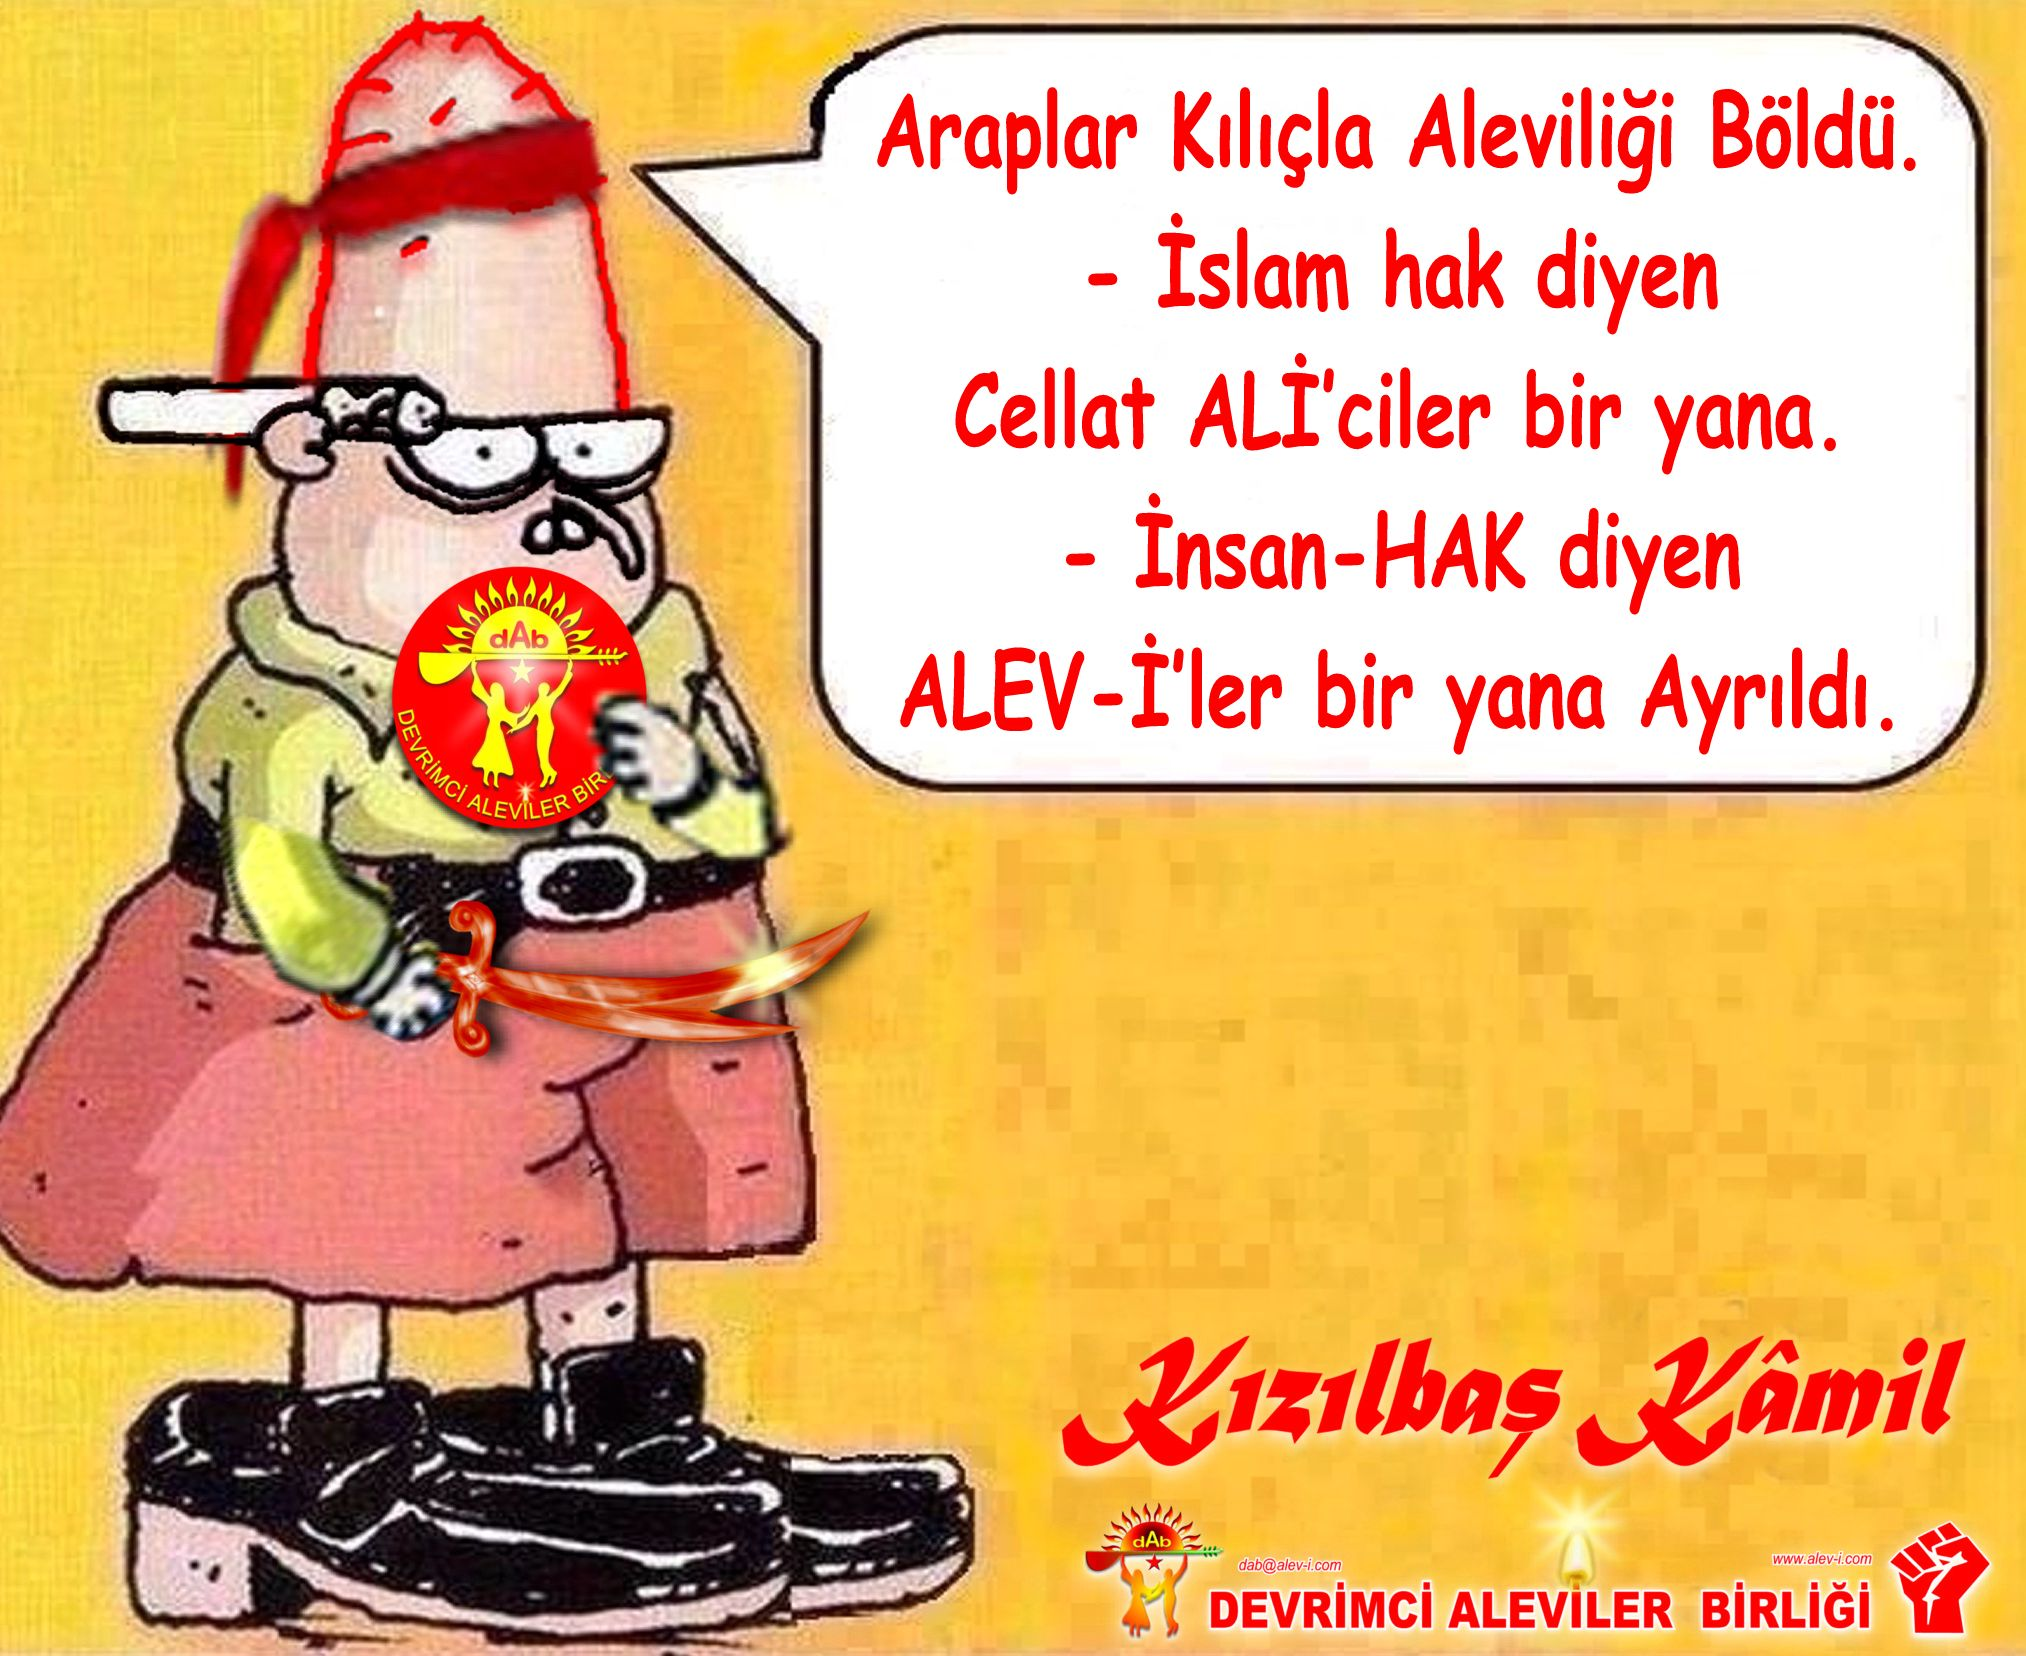 Devrimci Aleviler Birliği DAB Alevi Kızılbaş Bektaşi pir sultan cem hz Ali 12 imam semah Feramuz Şah Acar kizilbas kamil arap aleviligi boldu